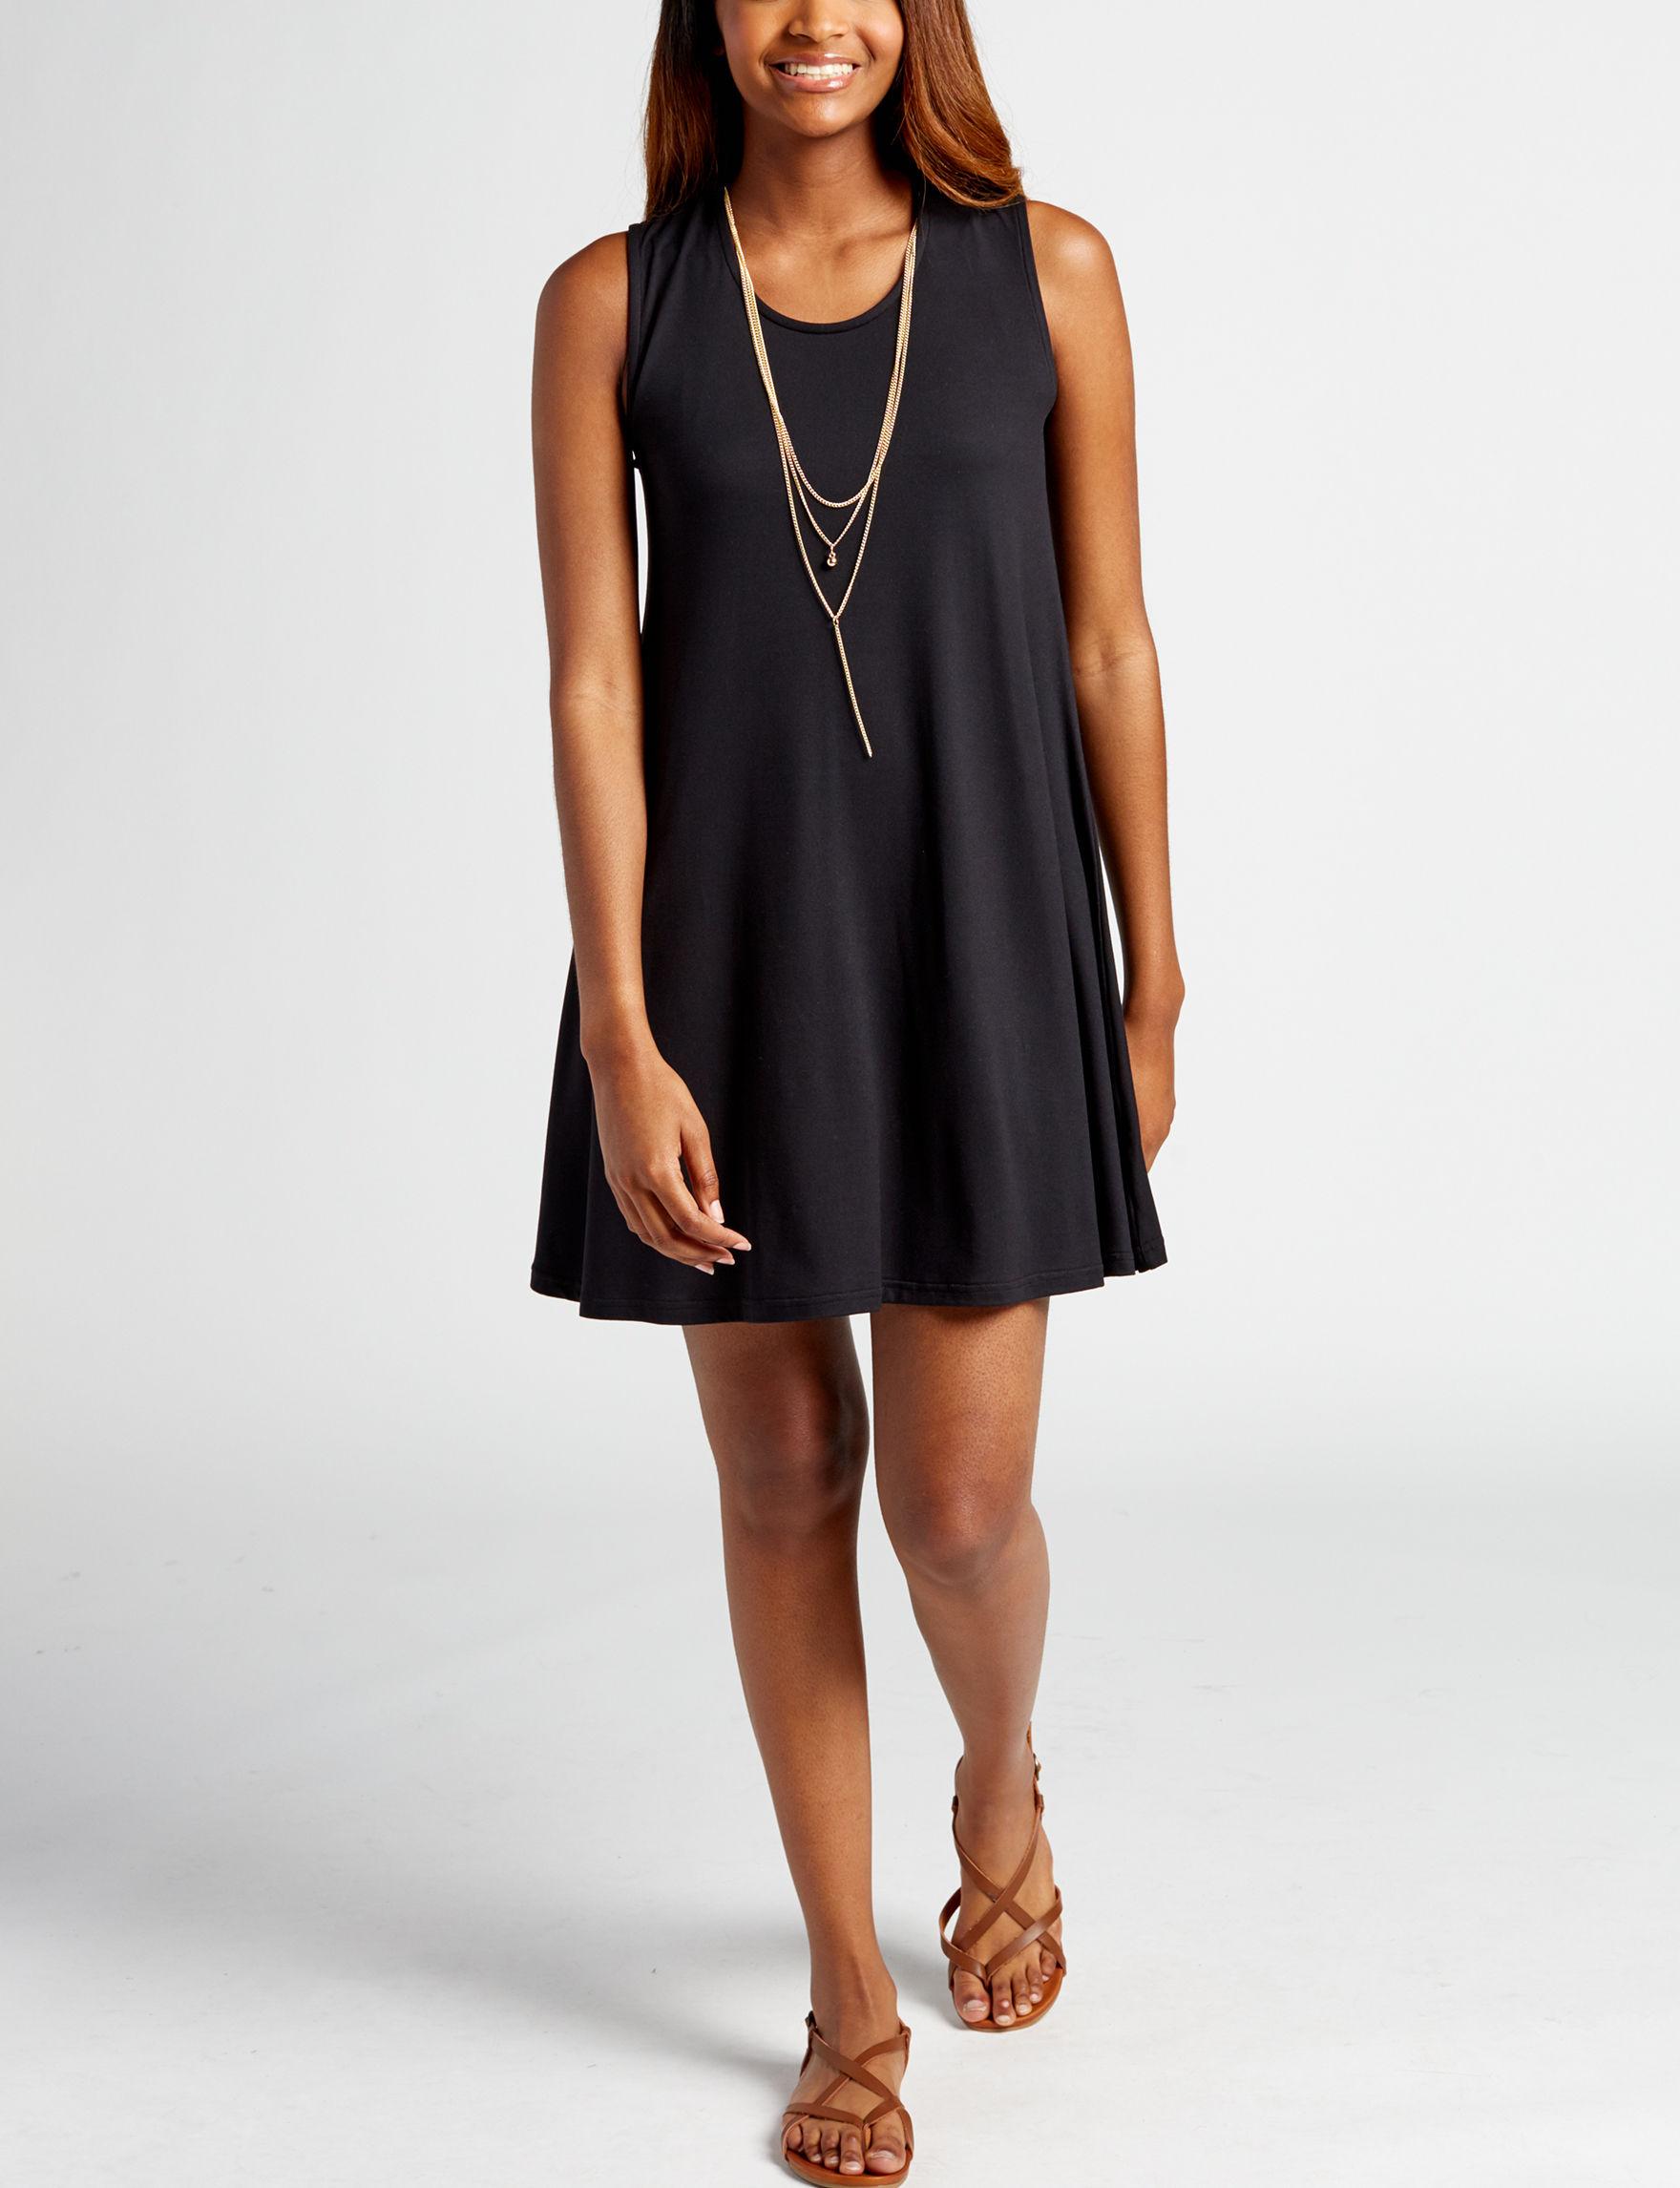 Wishful Park Black Everyday & Casual Shift Dresses